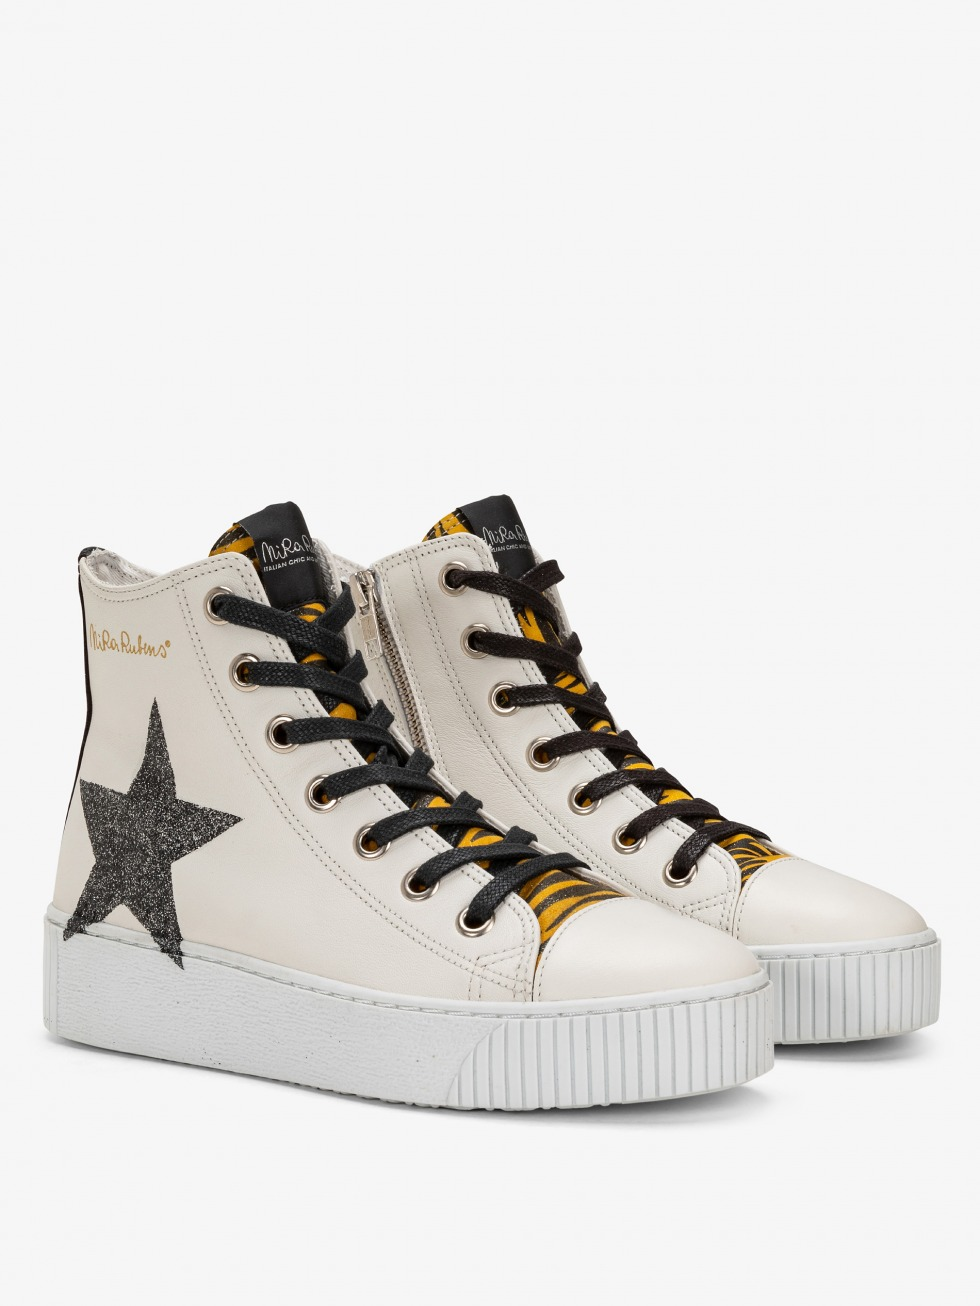 Long Island Sneakers - Tiger Star